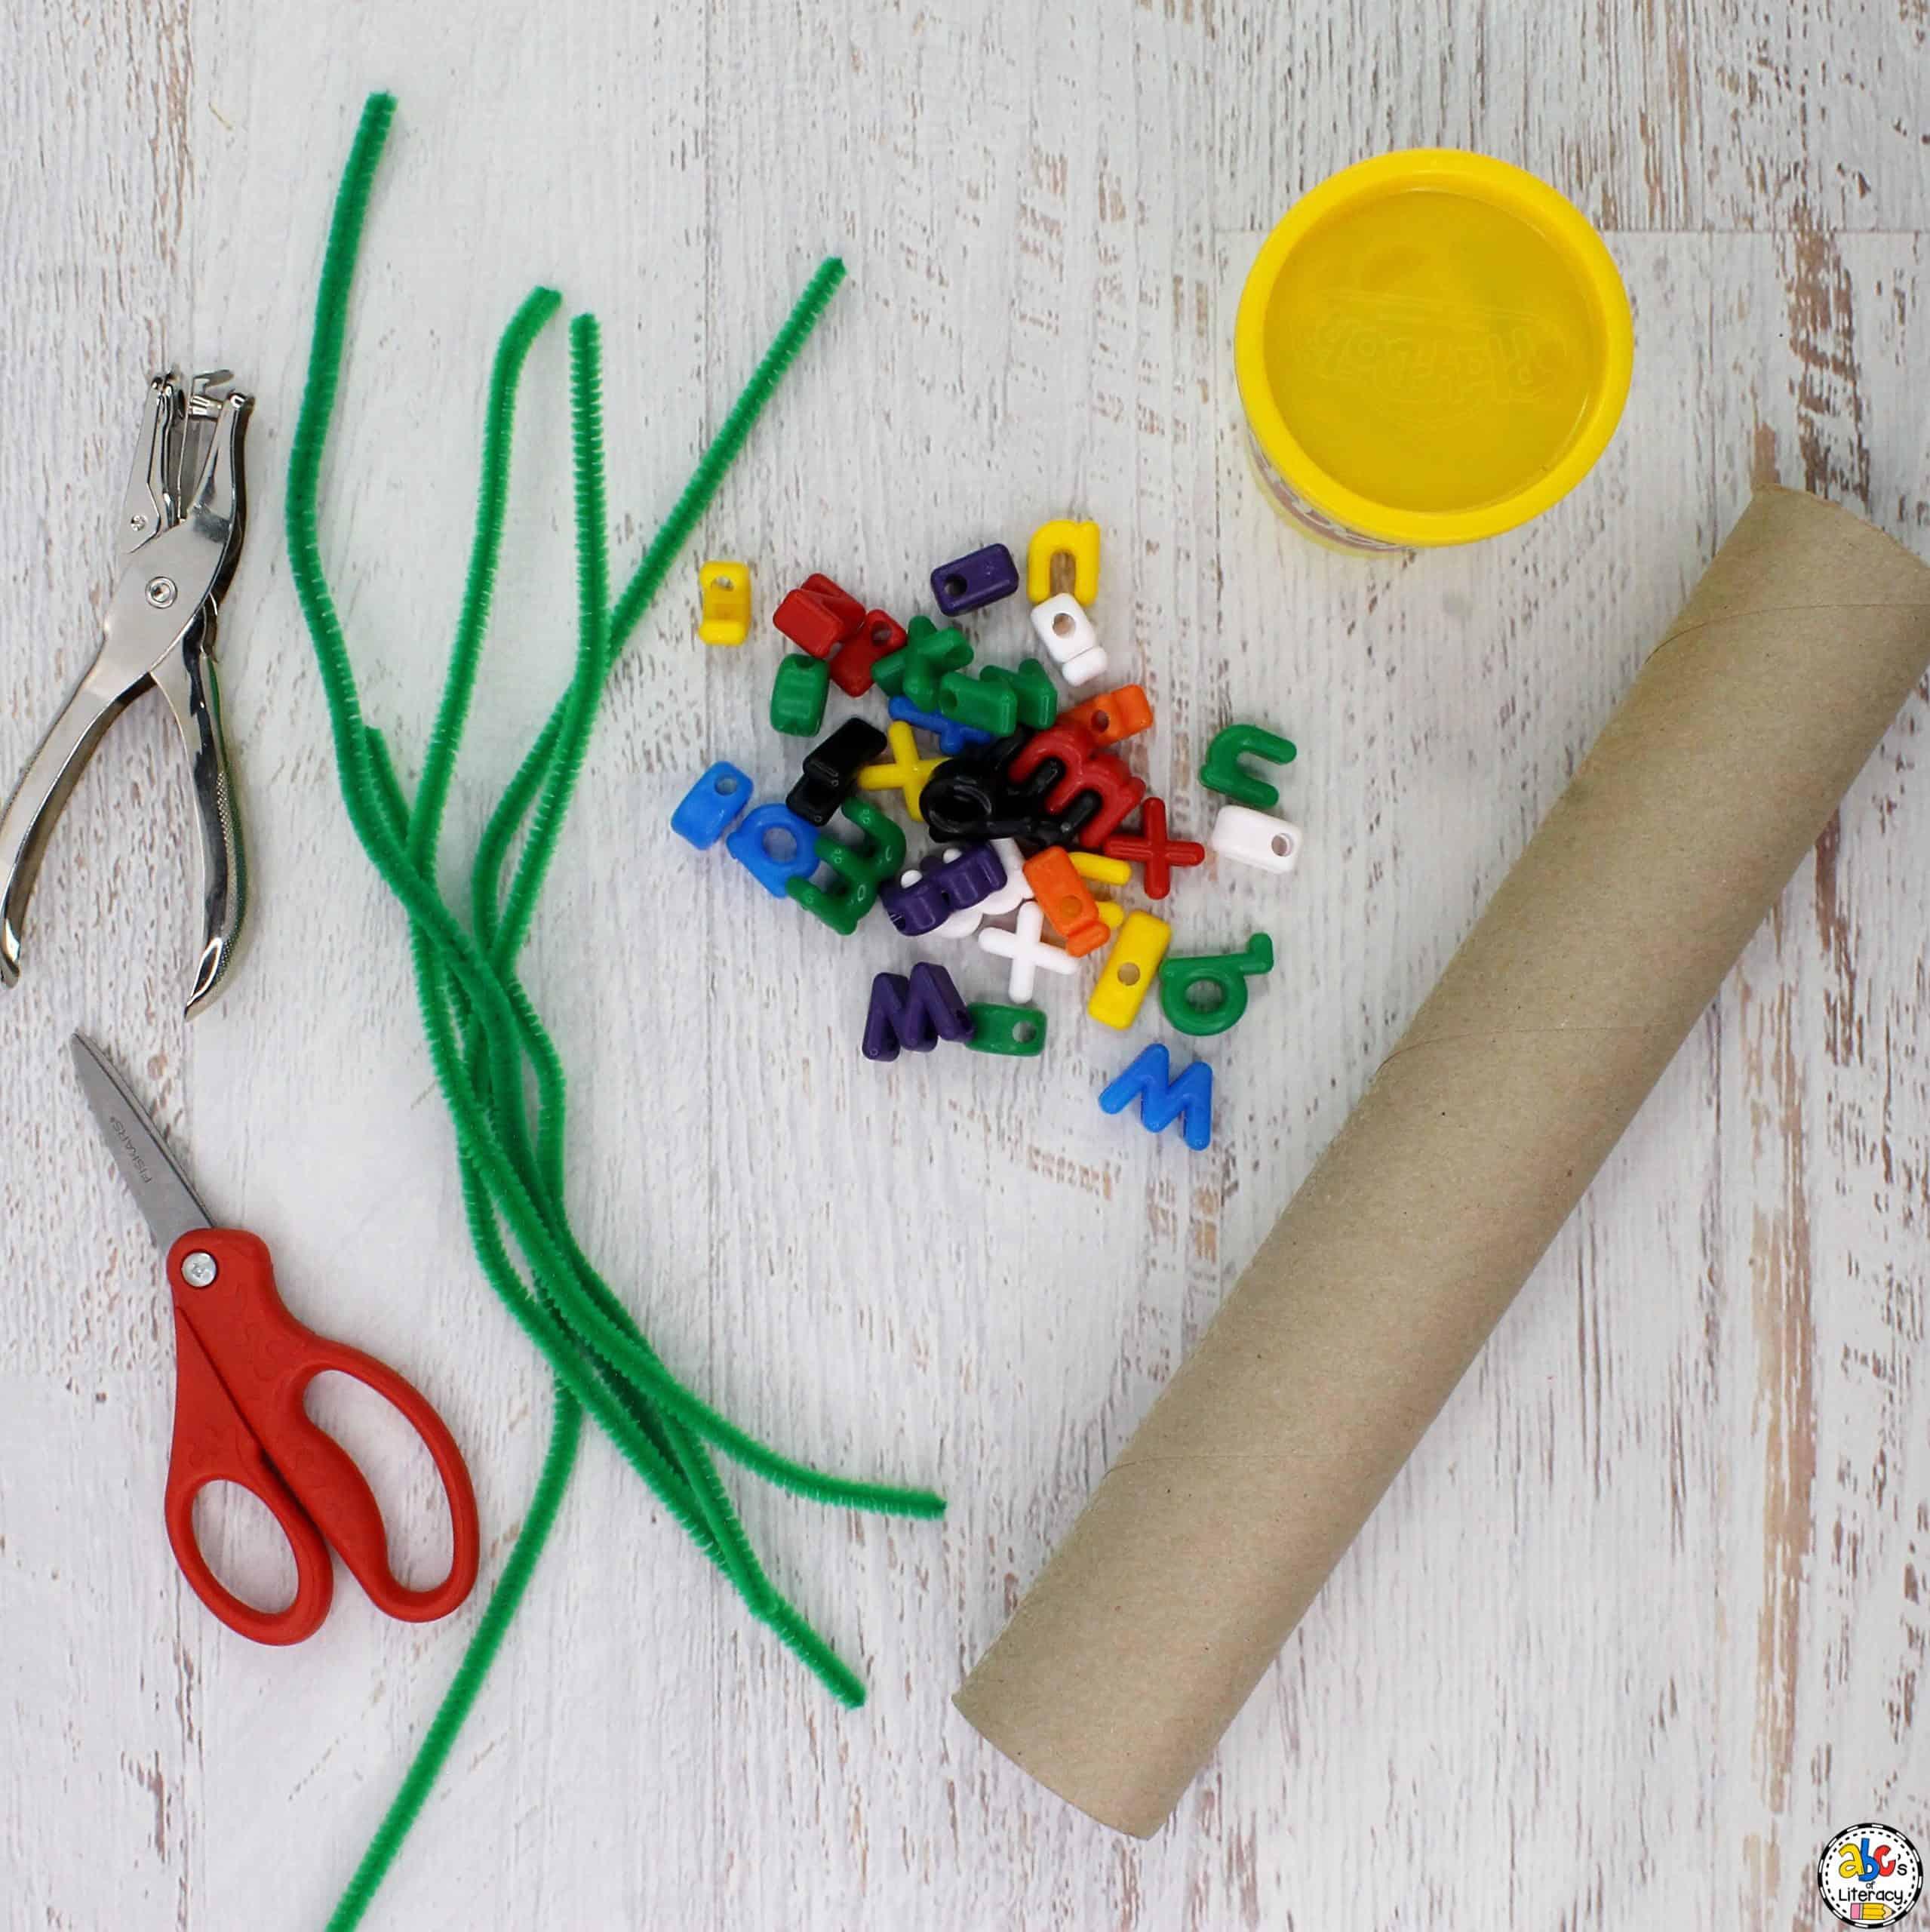 Simple STEAM Activity Supplies